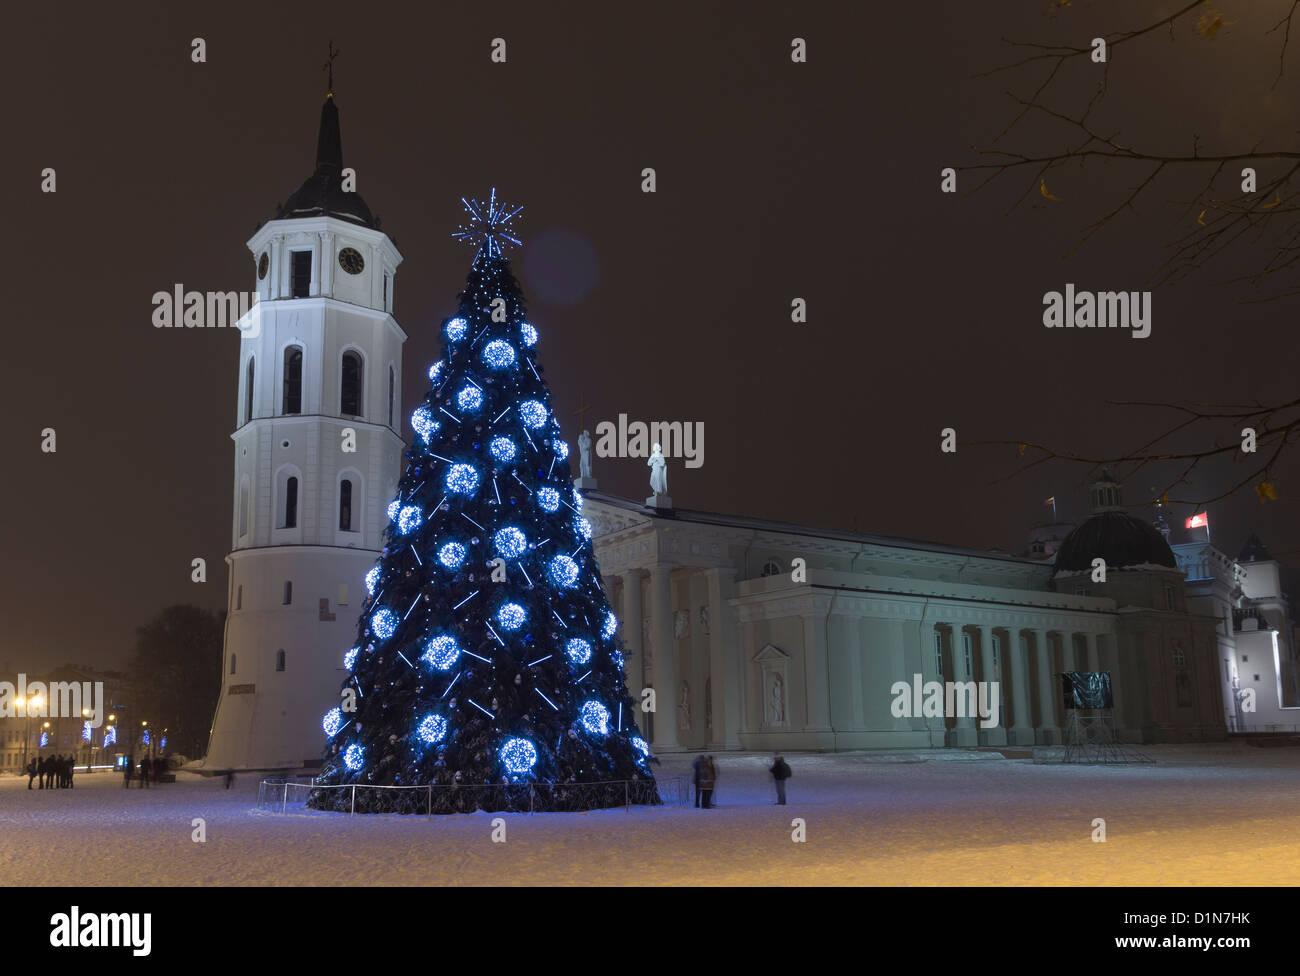 City Christmas Tree, Vilnius Lithuania 2012-2013 Stock Photo